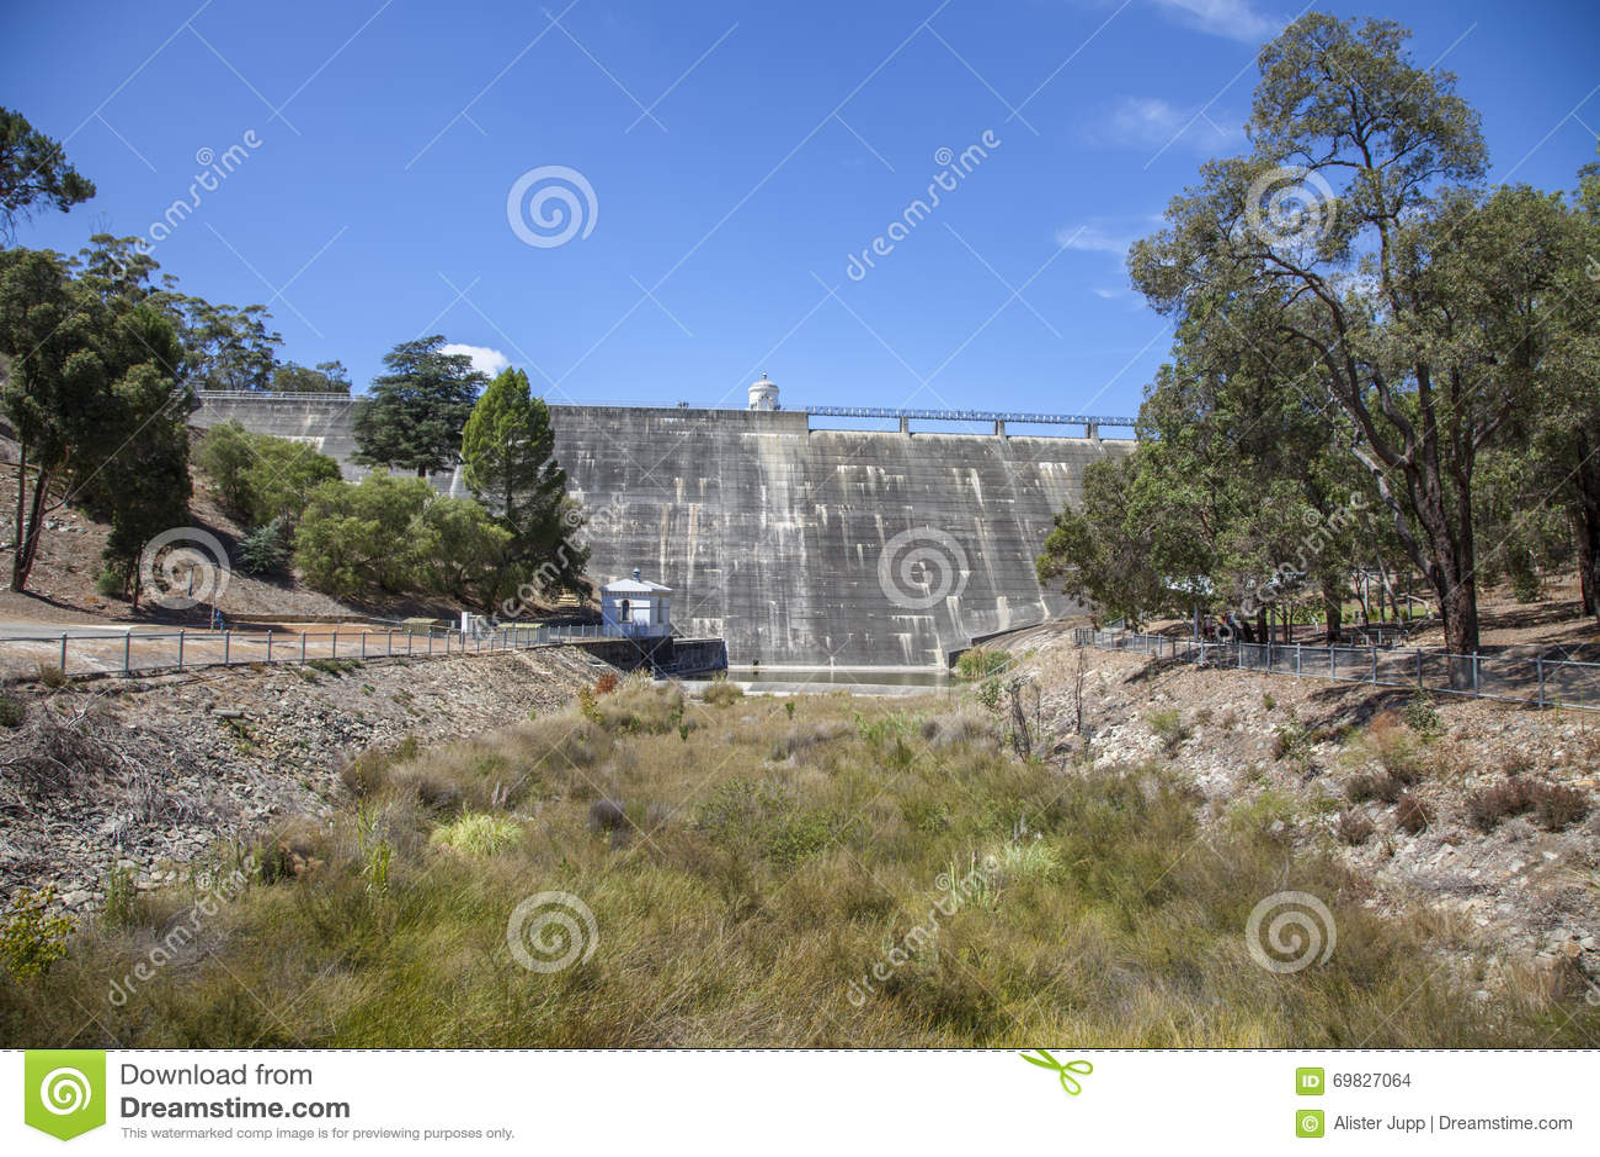 Weir Mundaring